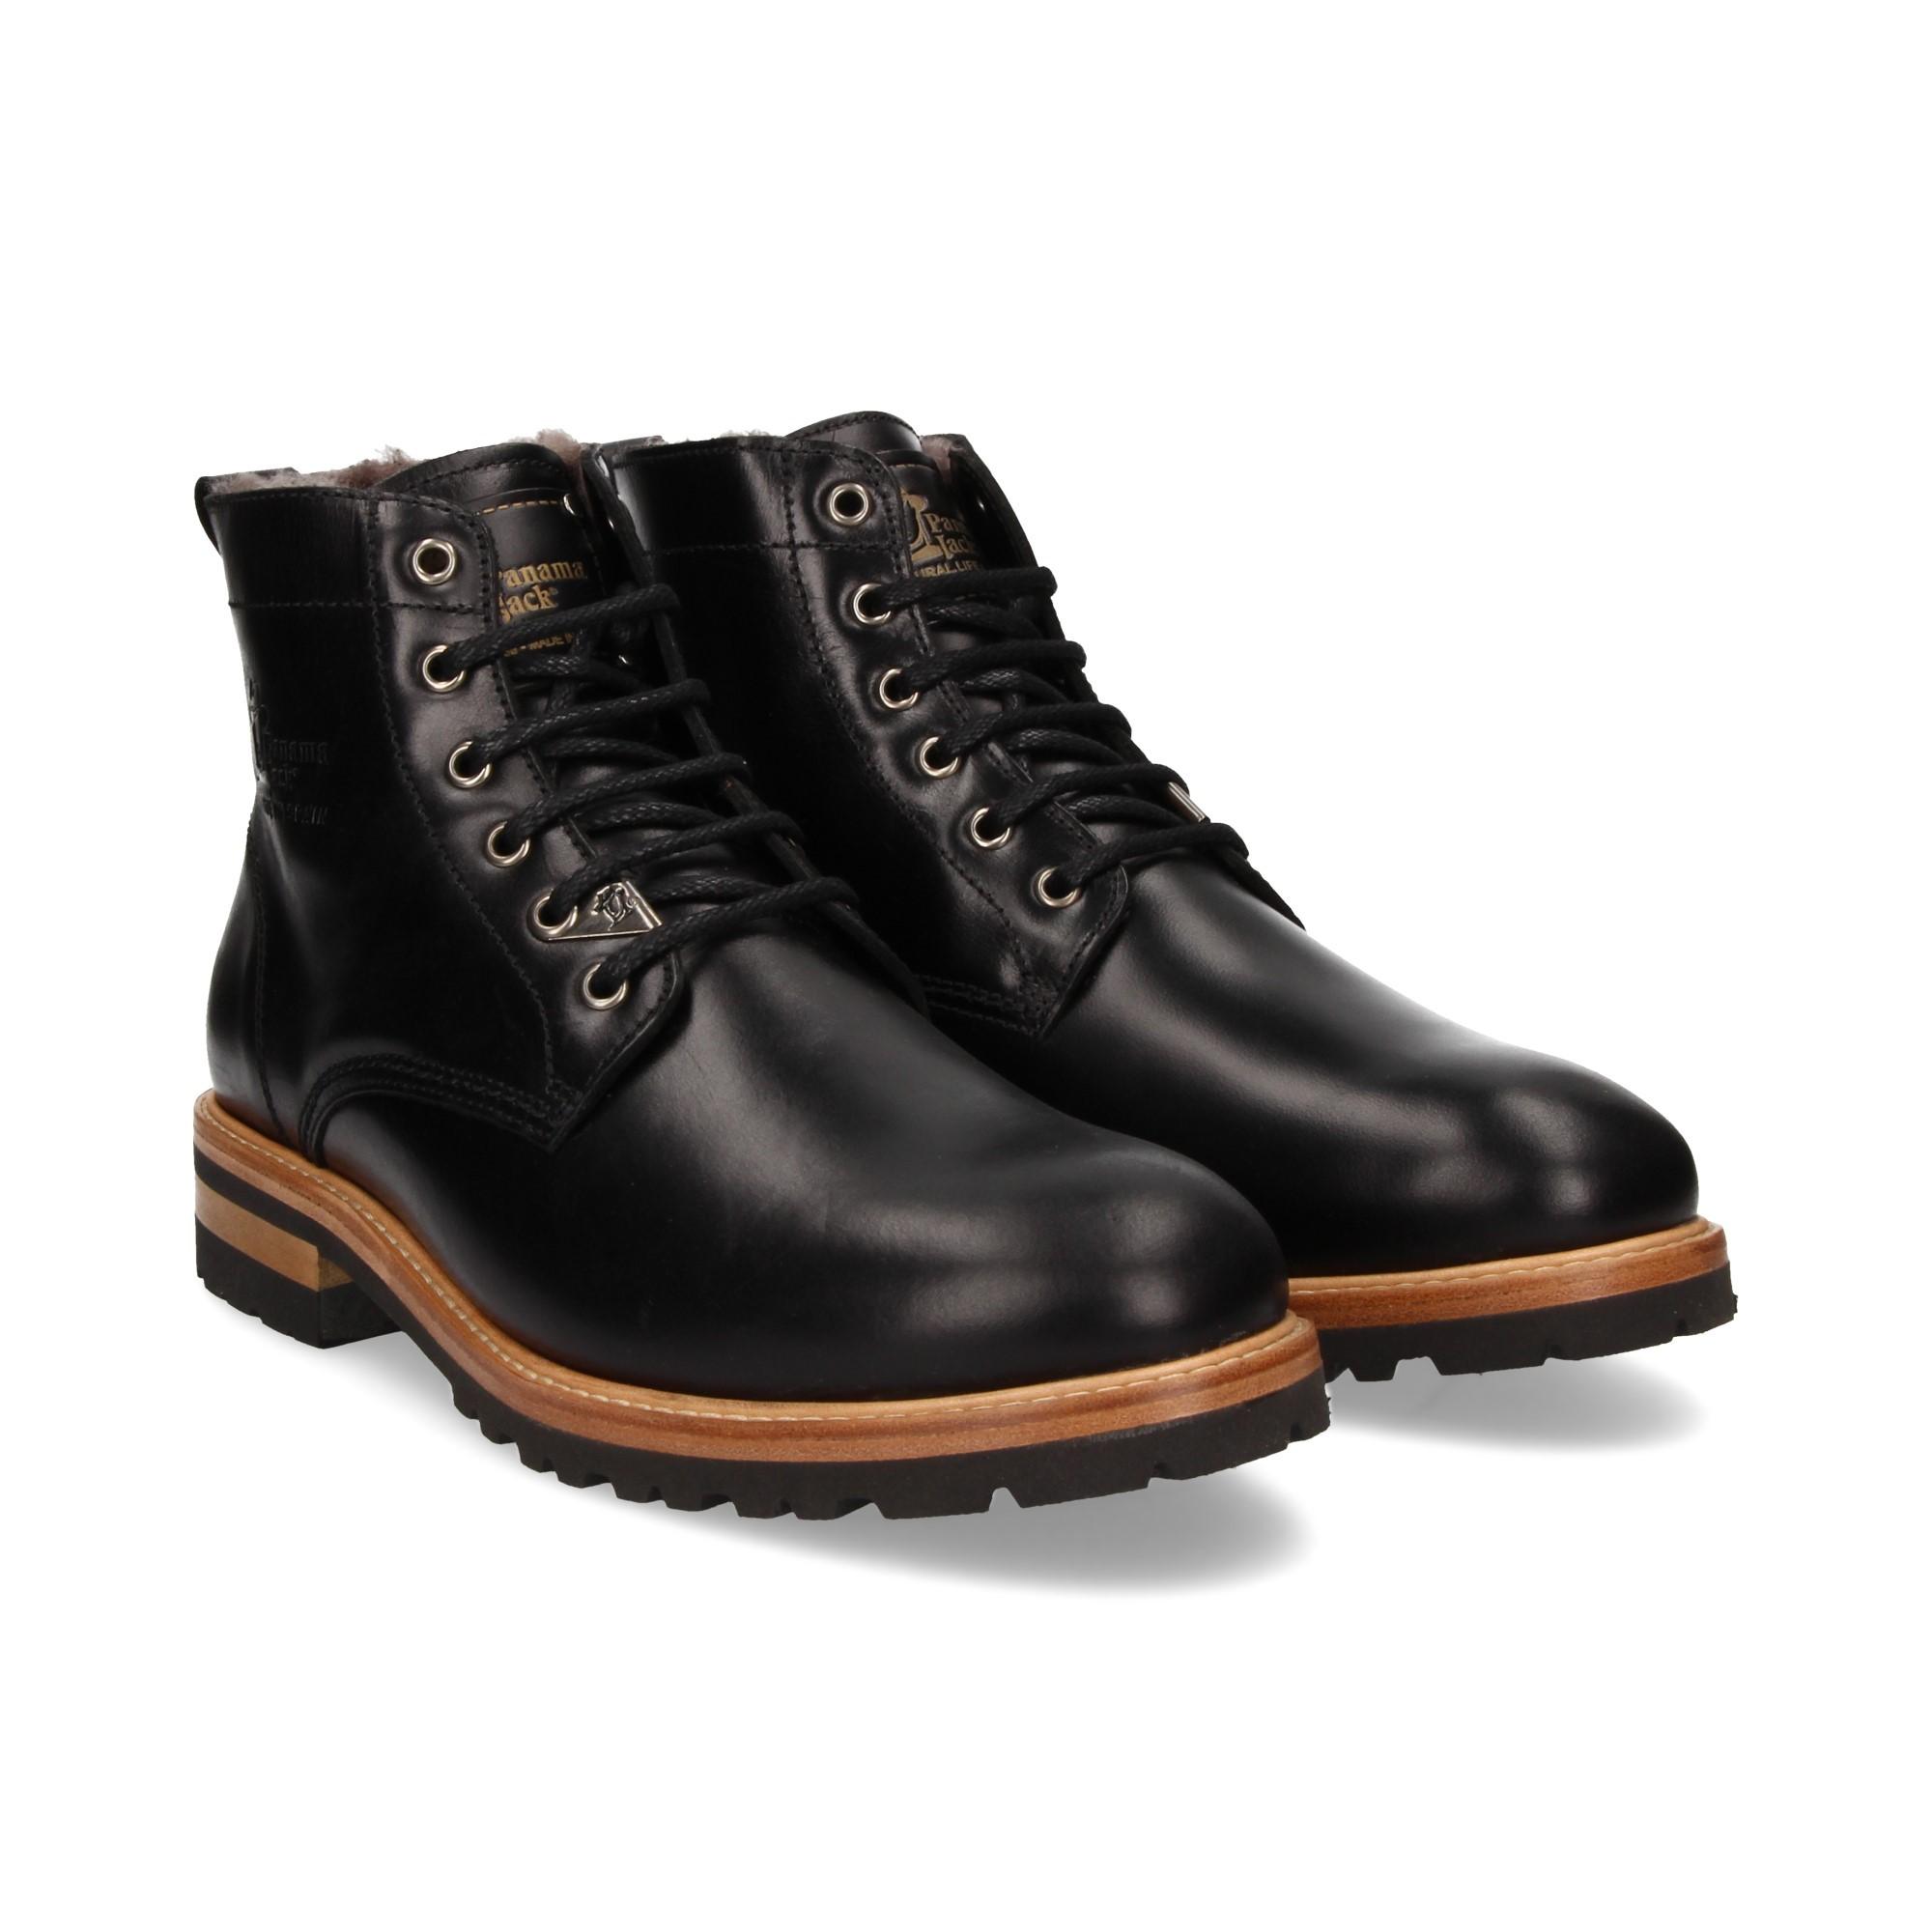 69ea4b20cdd PANAMA JACK Men s Ankle Boots EMERY C3 NAPA NEGRO